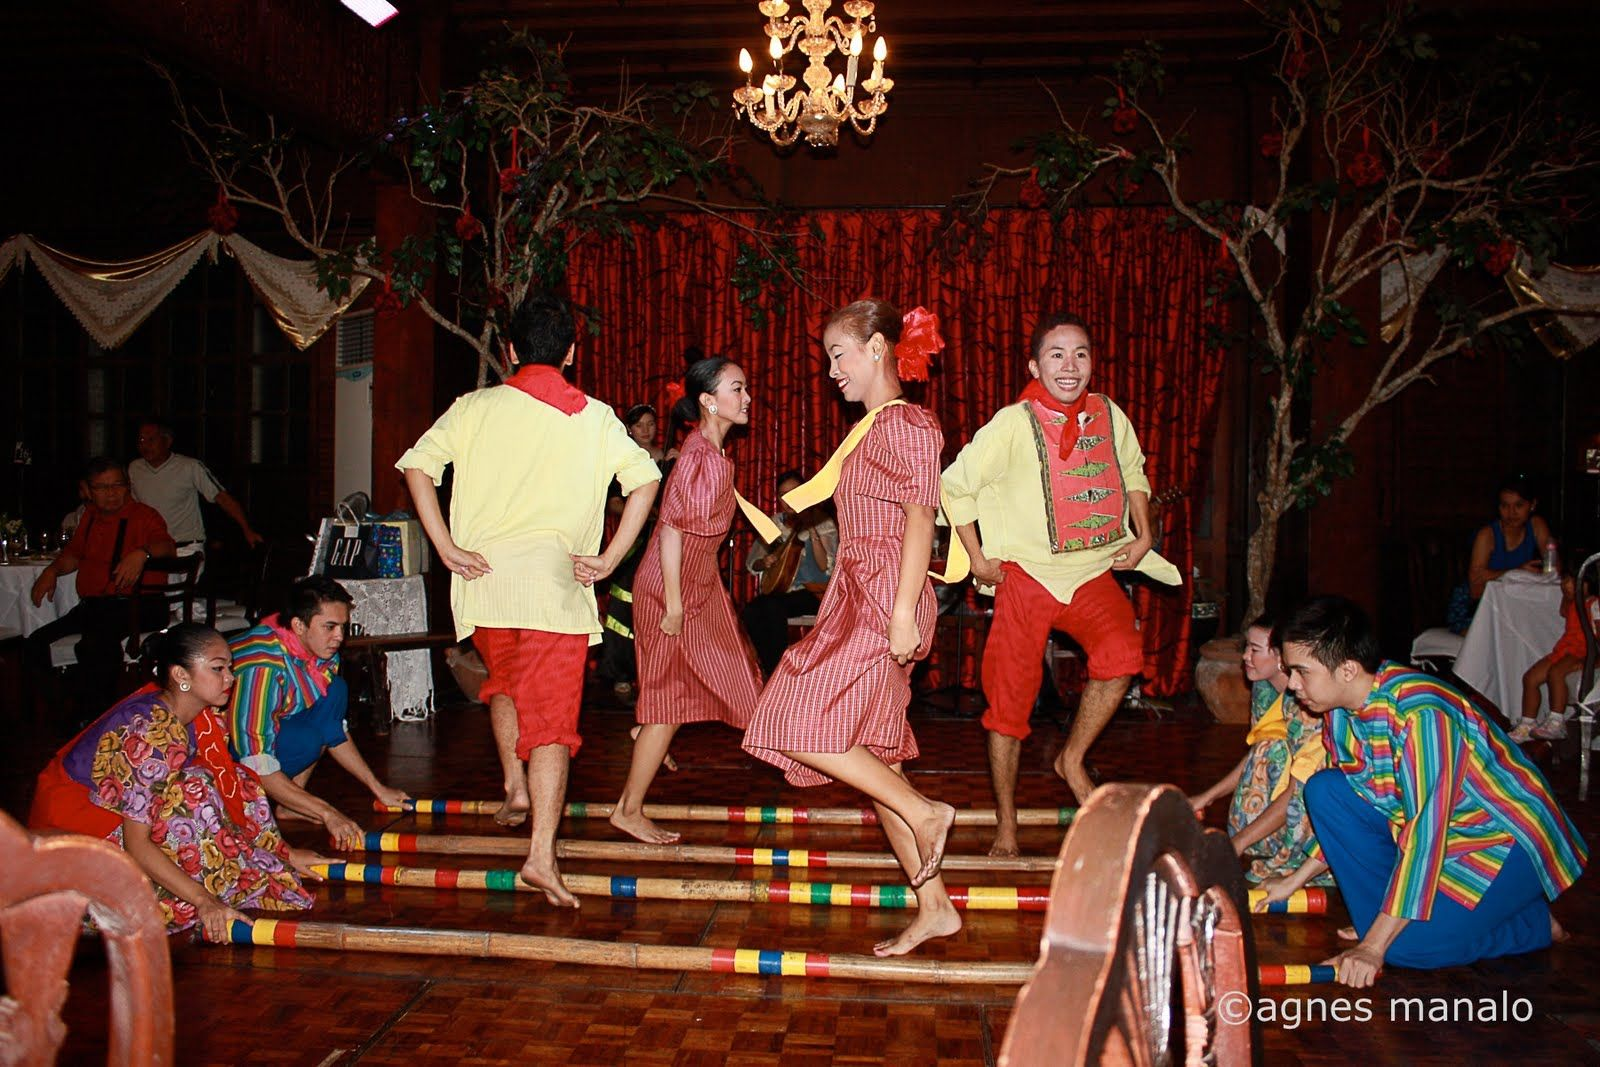 Philippines - National dance Tinikling | ~*~*pilipinas*~*~ | Pinterest